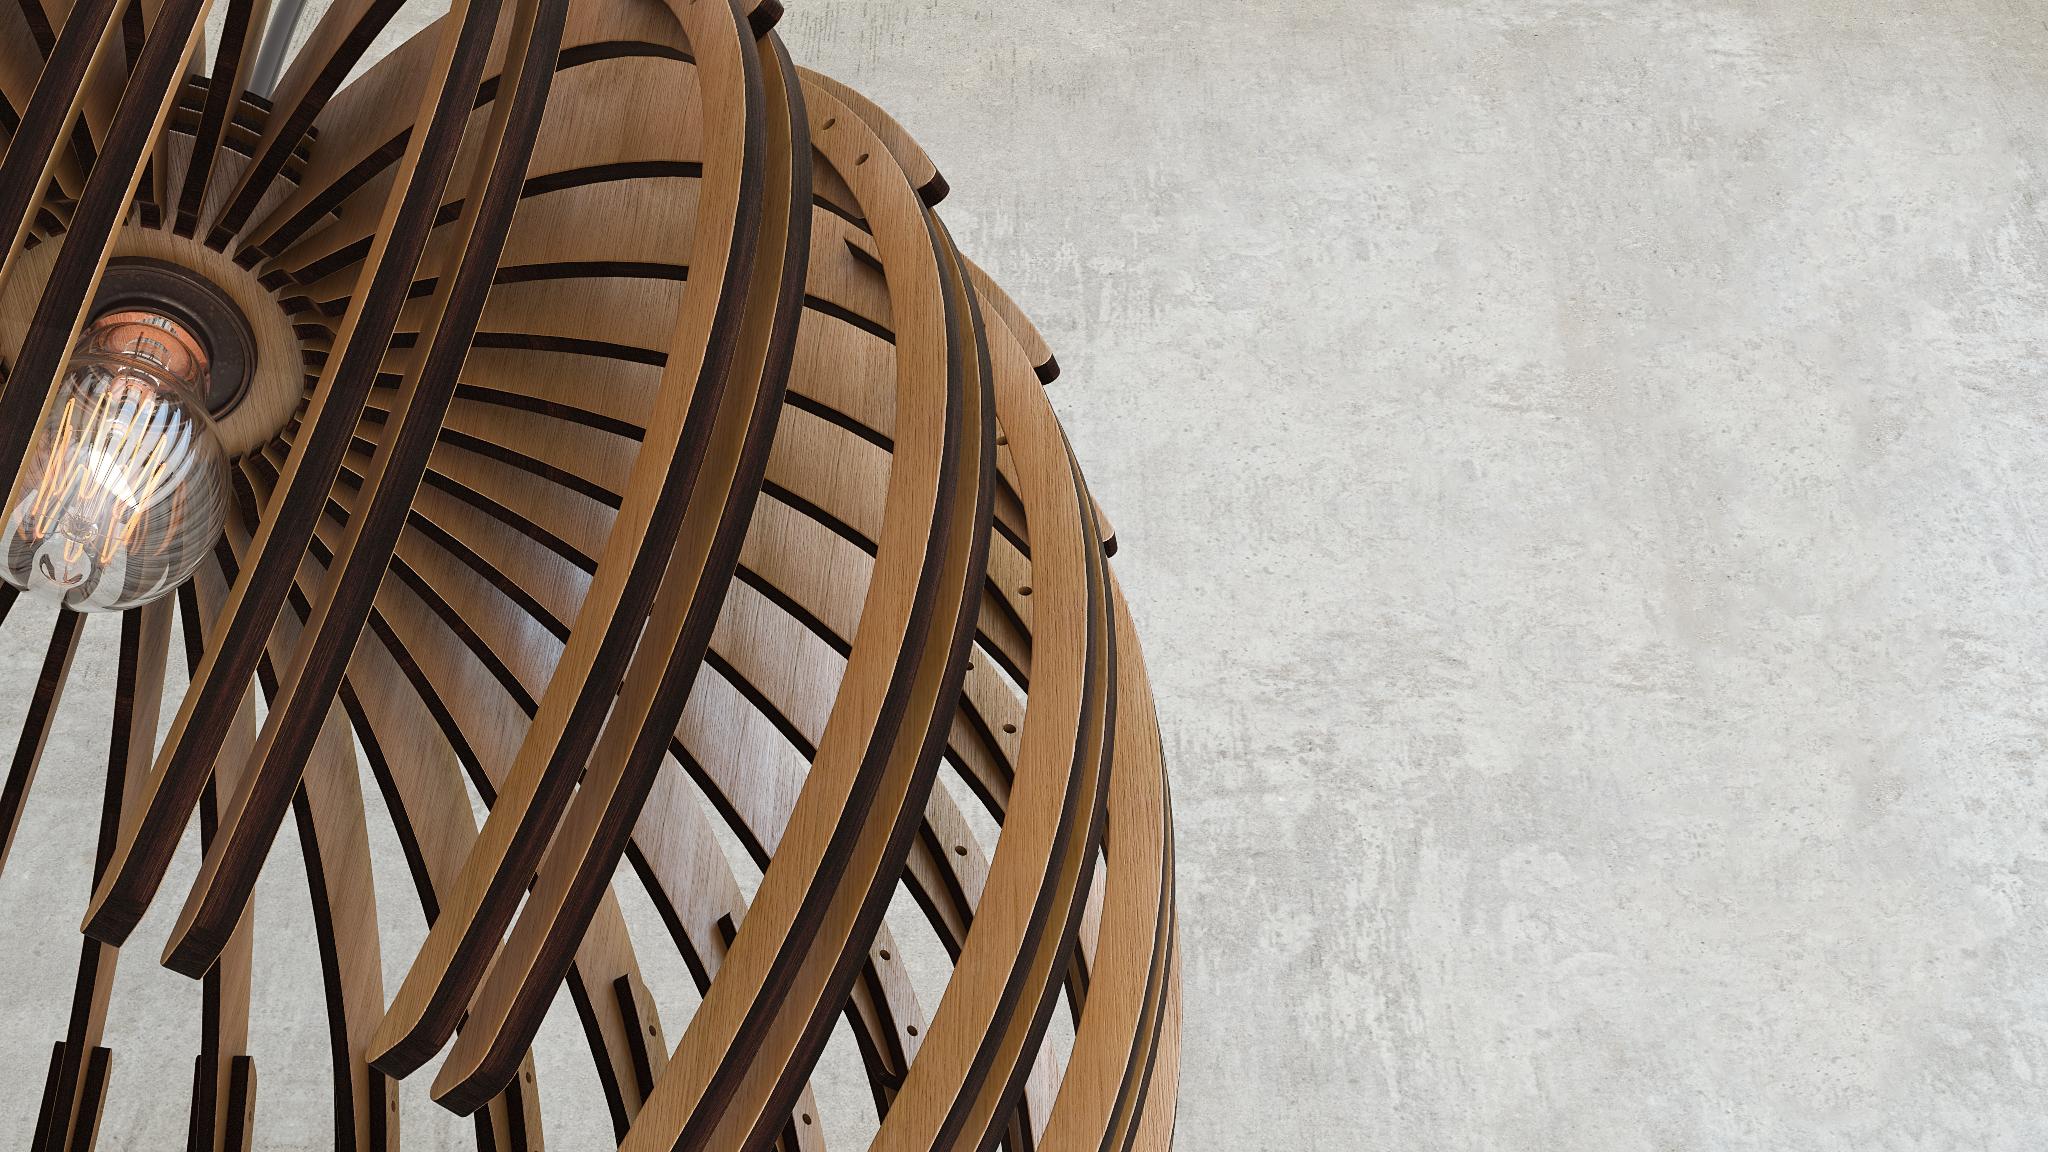 Wood Sphere Chandelier 3d Visualization by Arx Design on DeviantArt